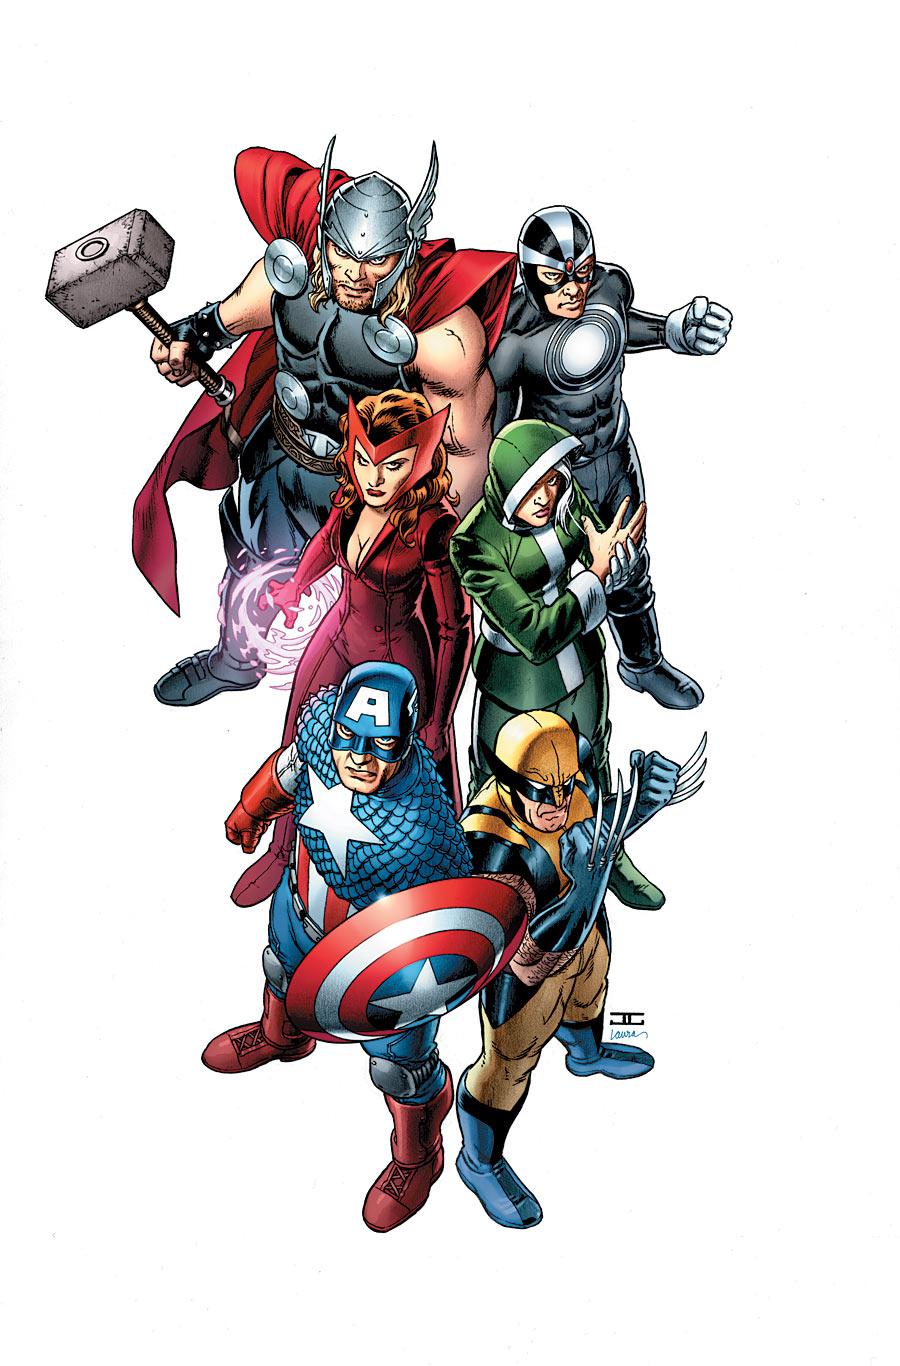 Uncanny avengers vol 1 1 marvel wiki fandom powered by - Images avengers ...